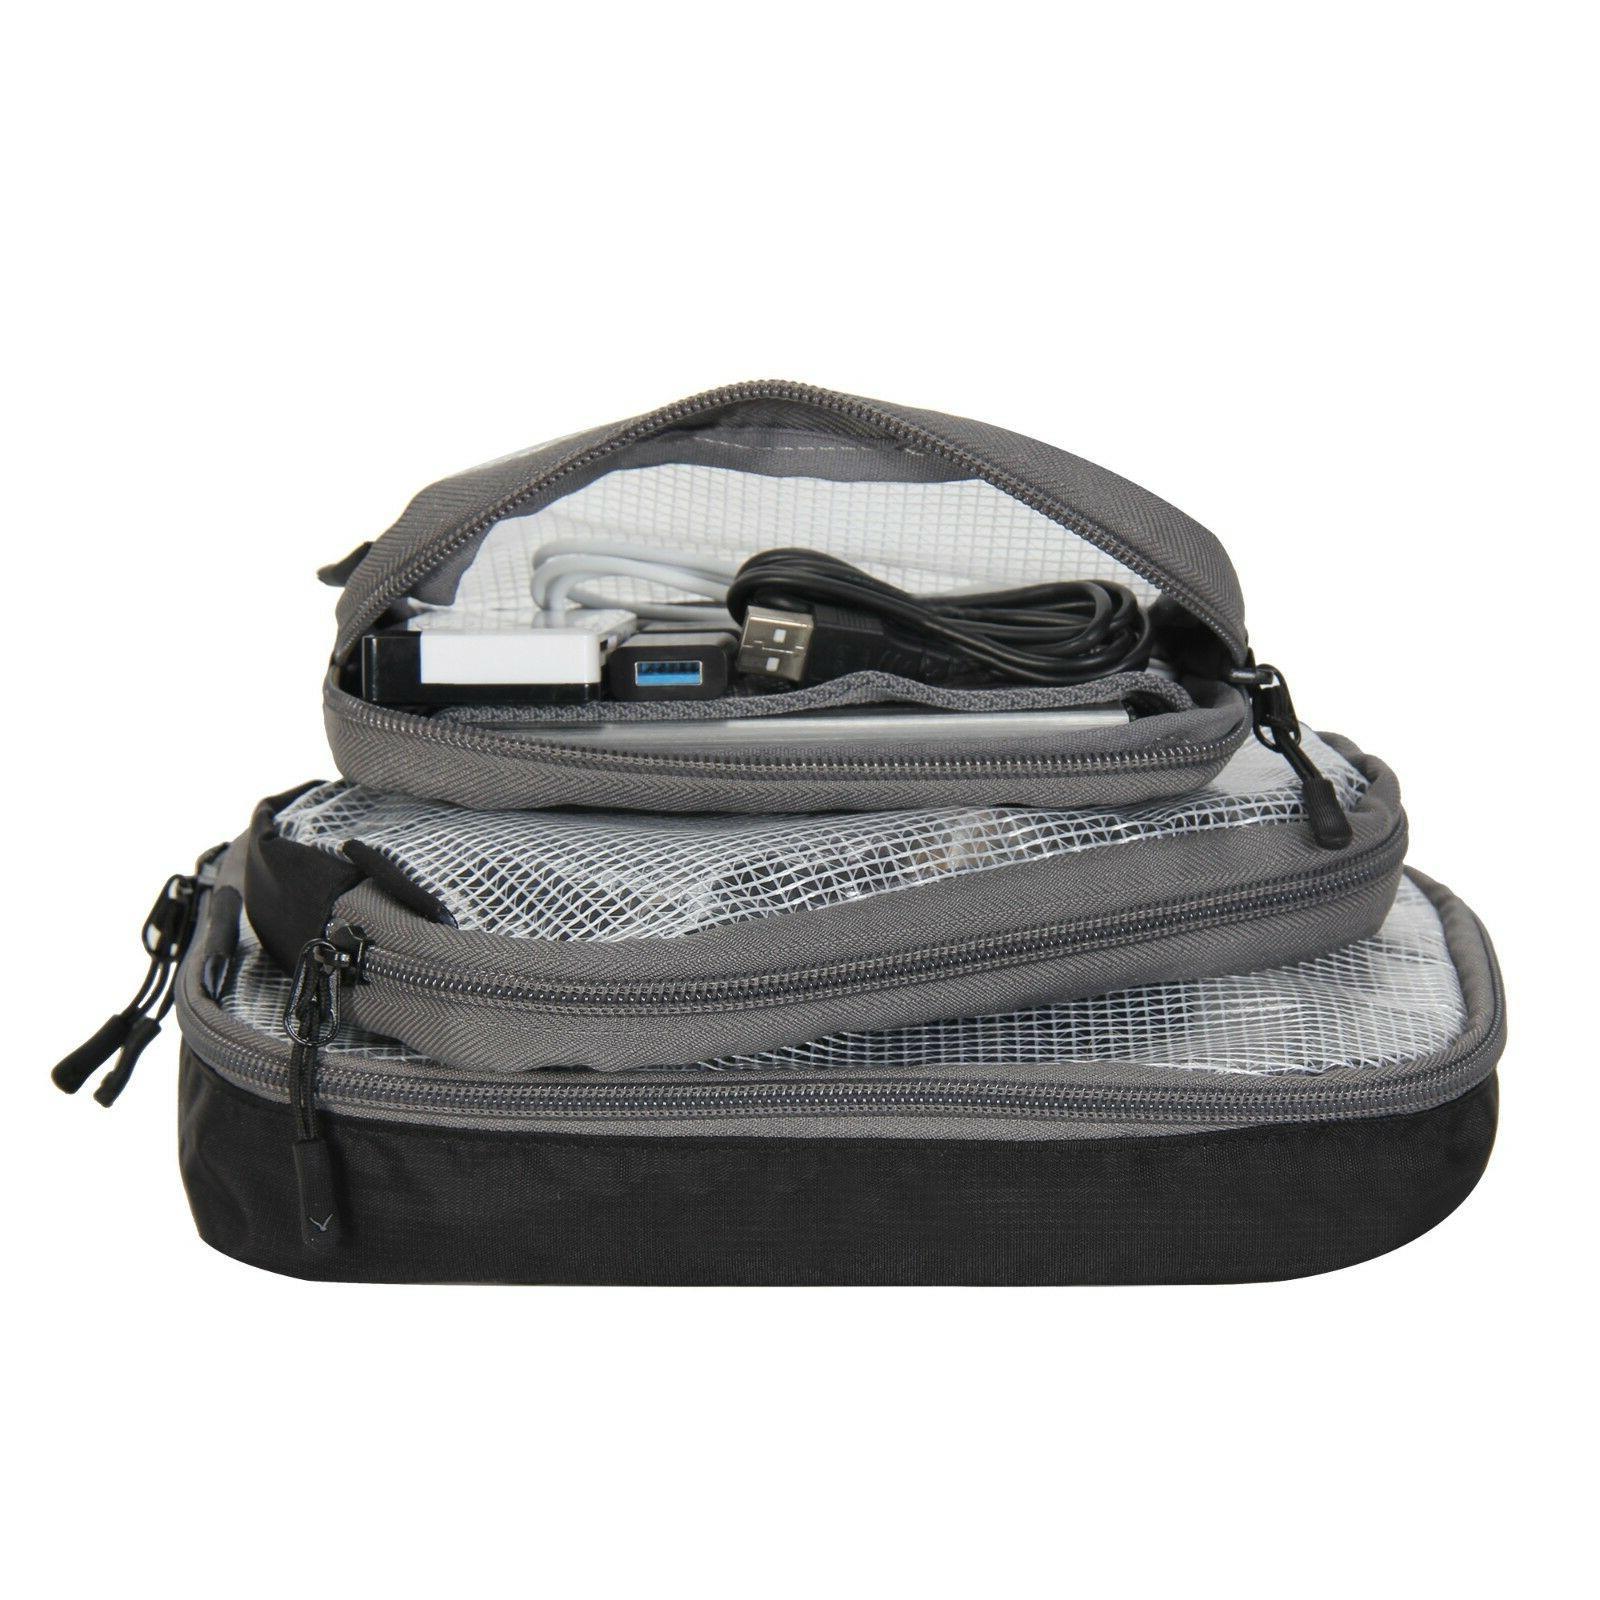 3pcs Small Size Multifunction Travel Organizer Case Packing